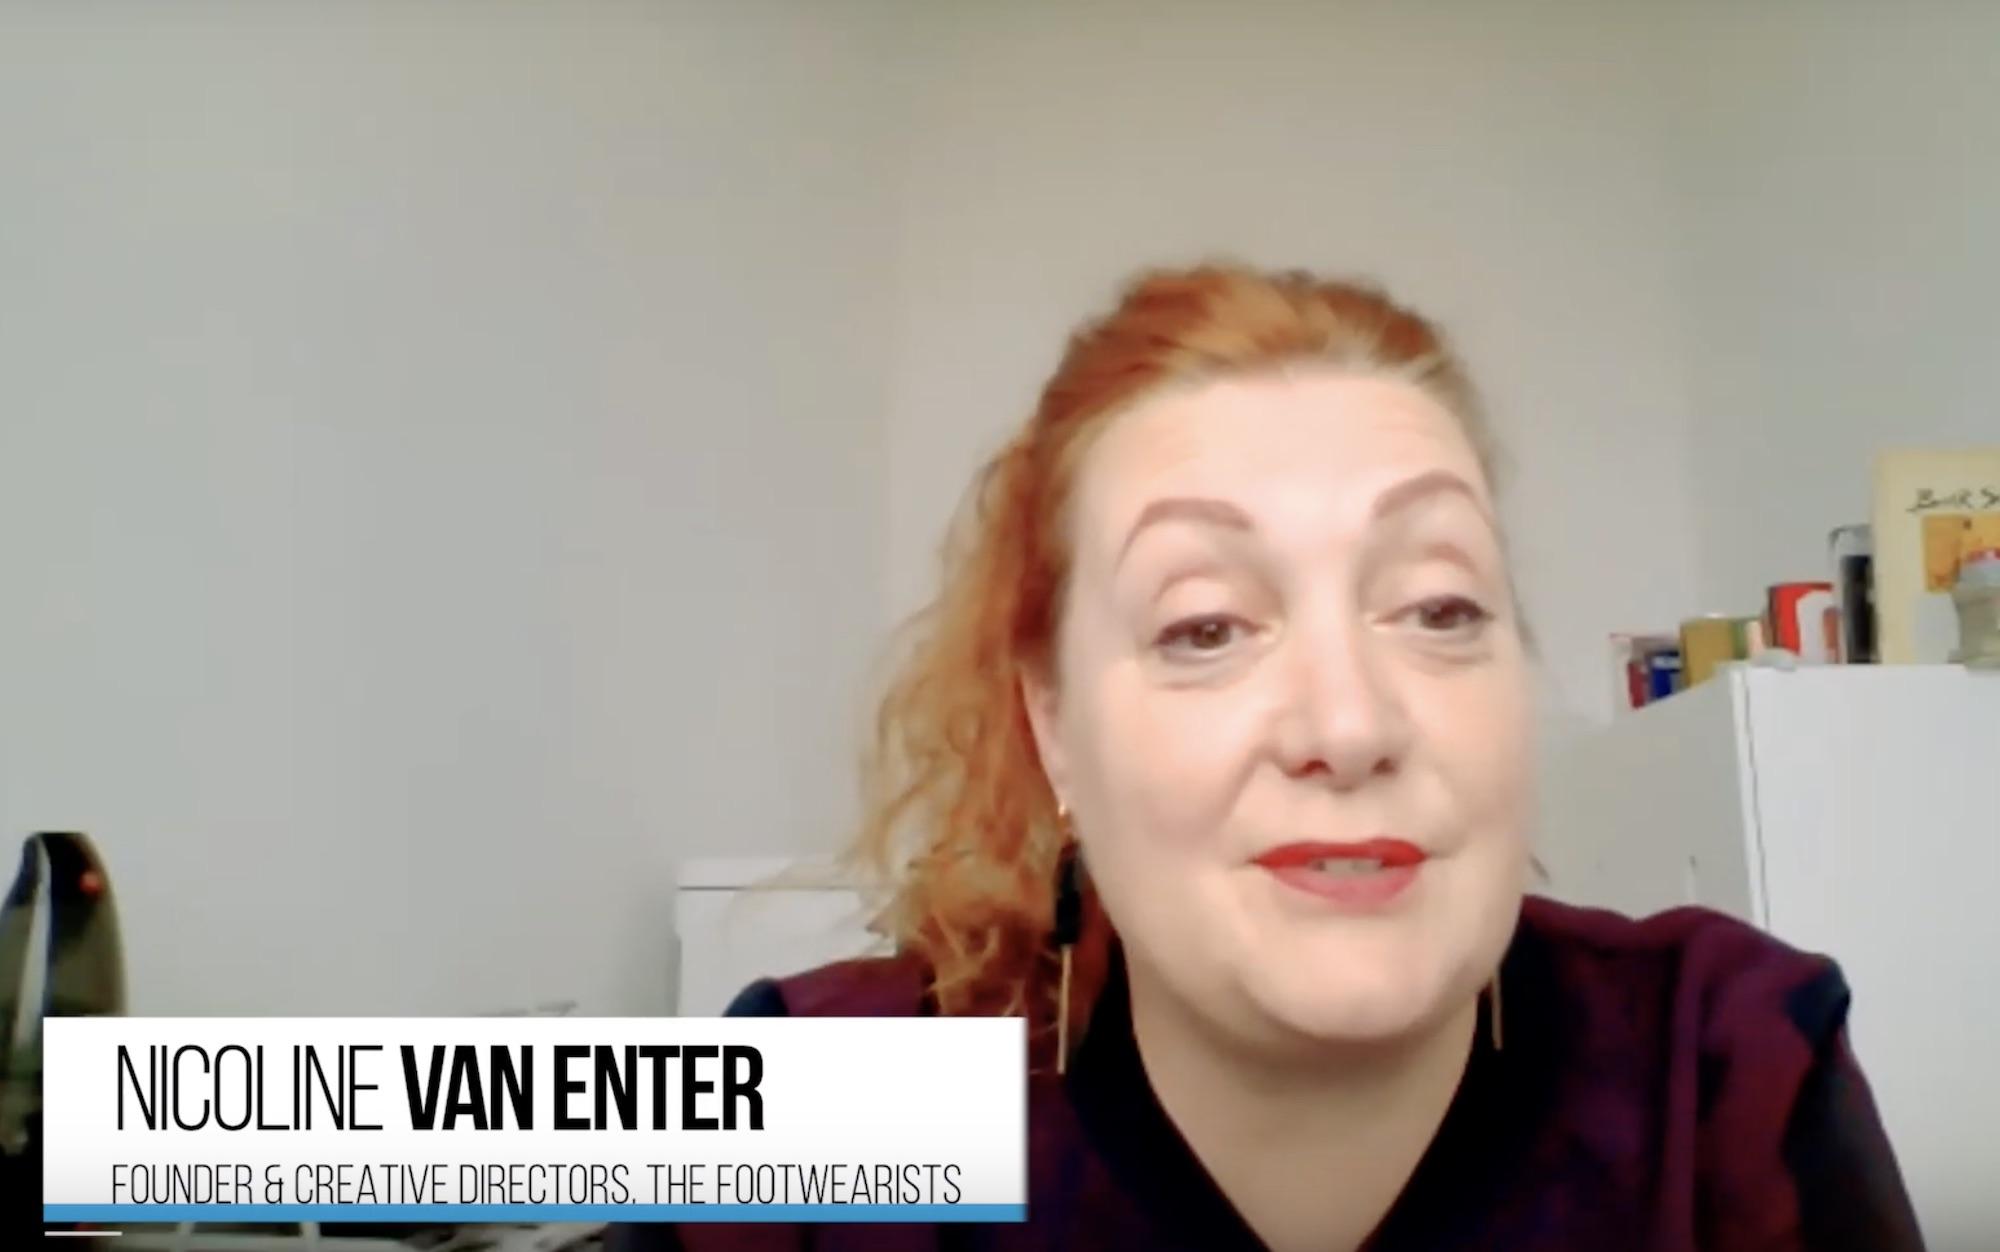 Nicoline van Enter, Founder at the Footwearists